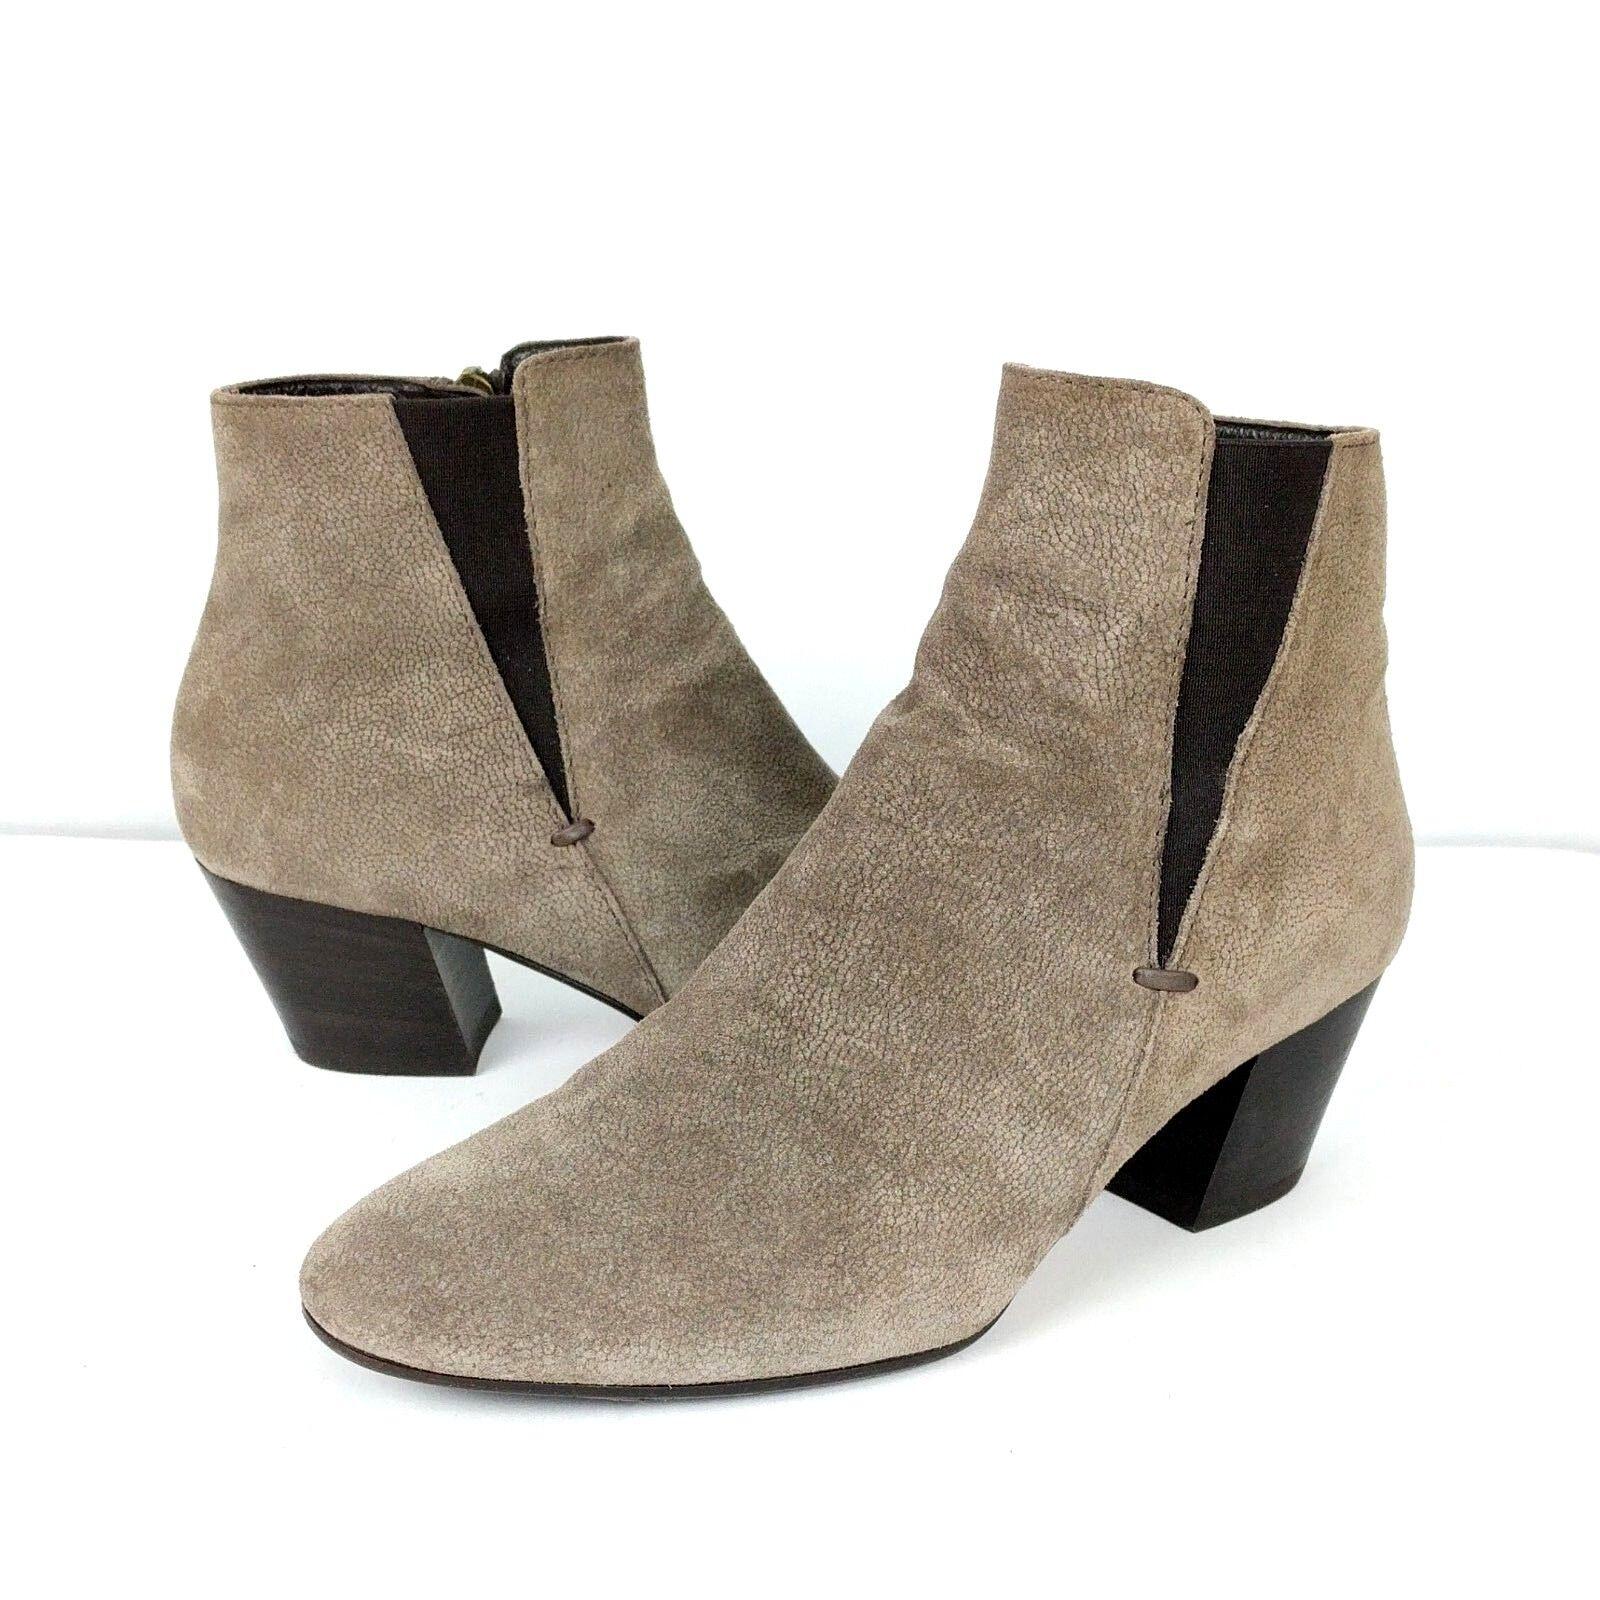 Aquatalia damen Größe 6 Stiefelies Faylynn Taupe Suede Texturot Ankle Stiefel